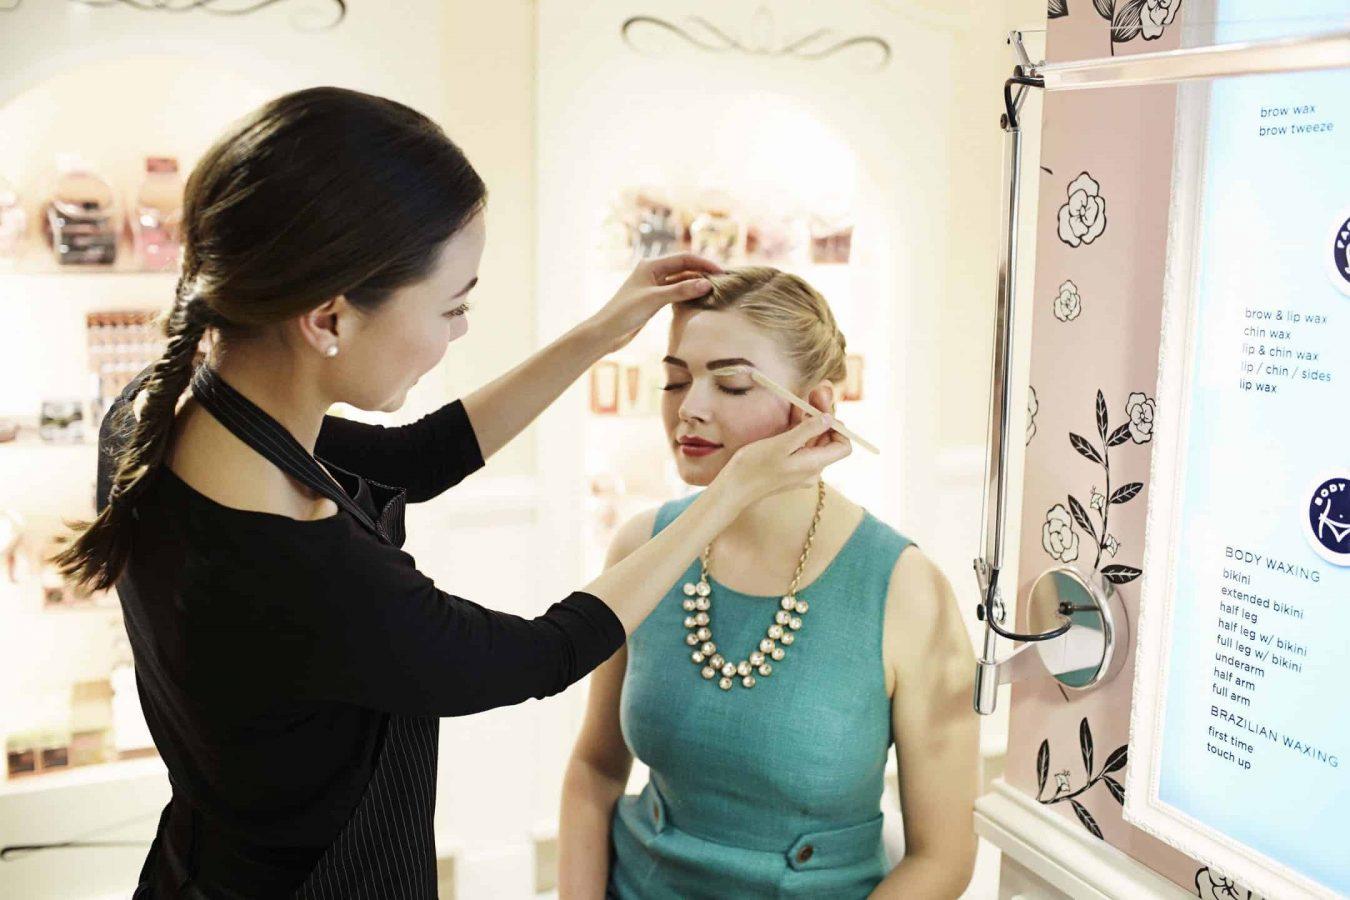 REVIEW: Benefit lash & brow tint